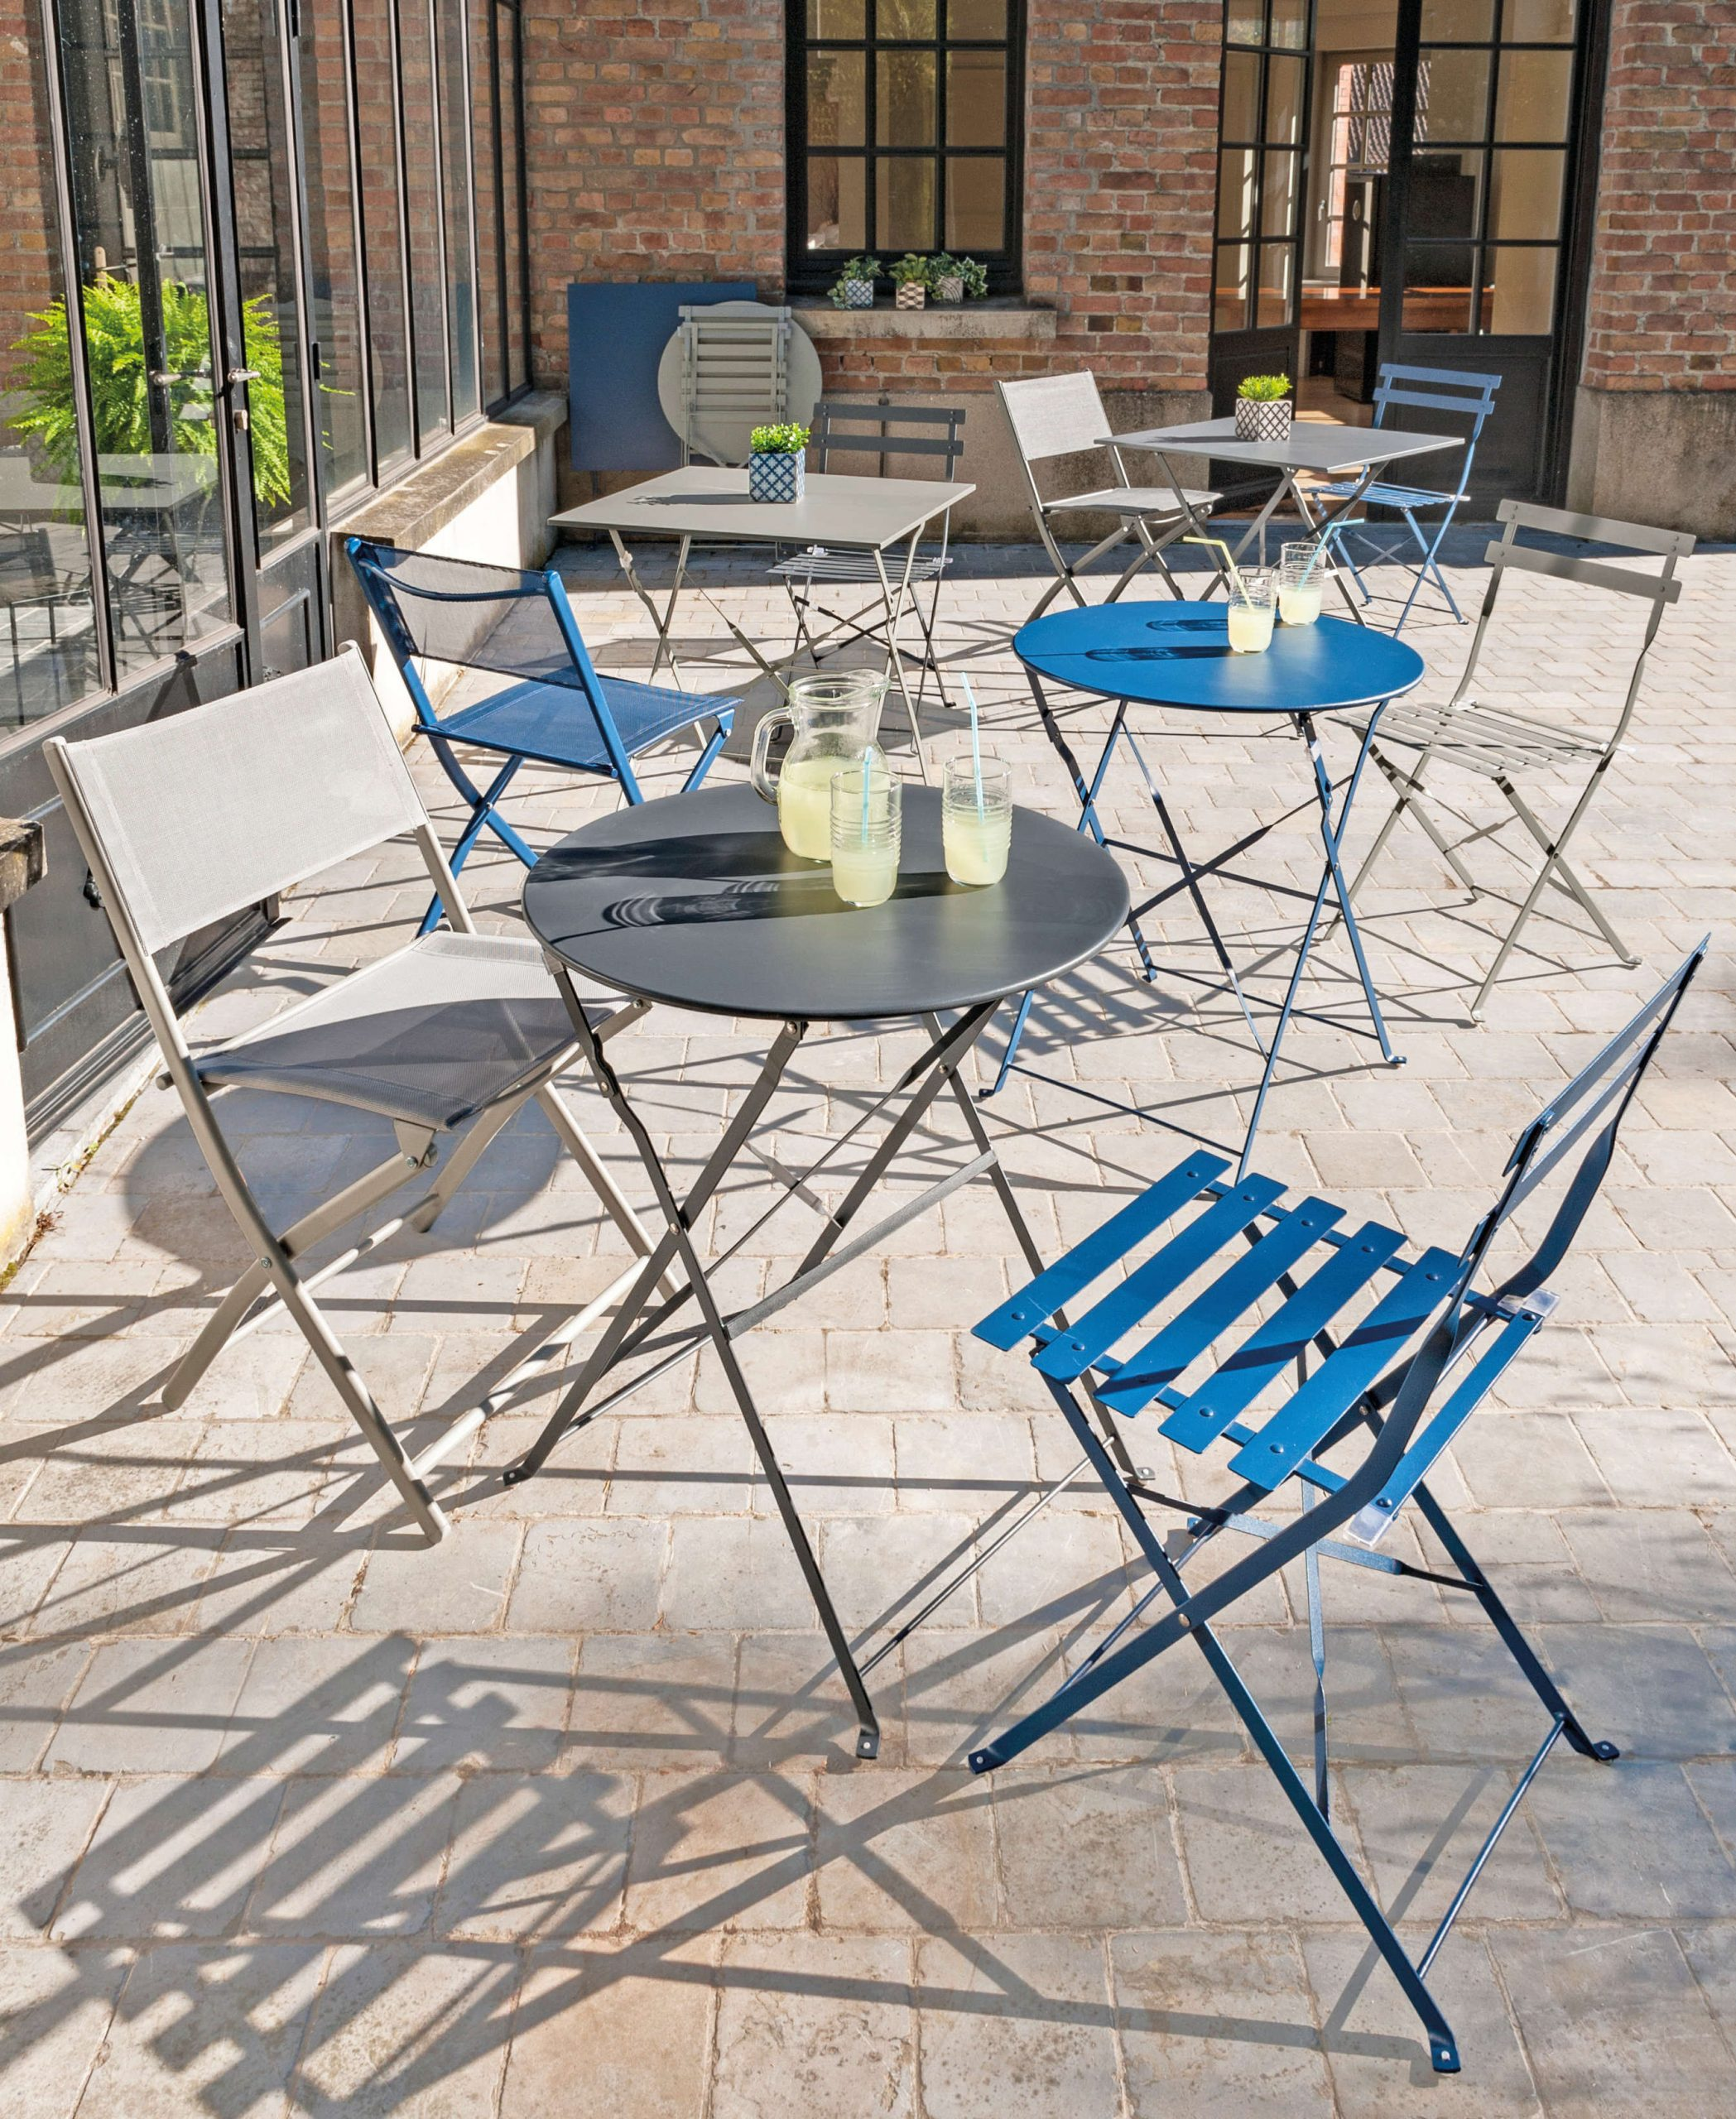 Style : Le Style Industriel S'invite Au Jardin   Blog La ... destiné Salon De Jardin La Foir Fouille